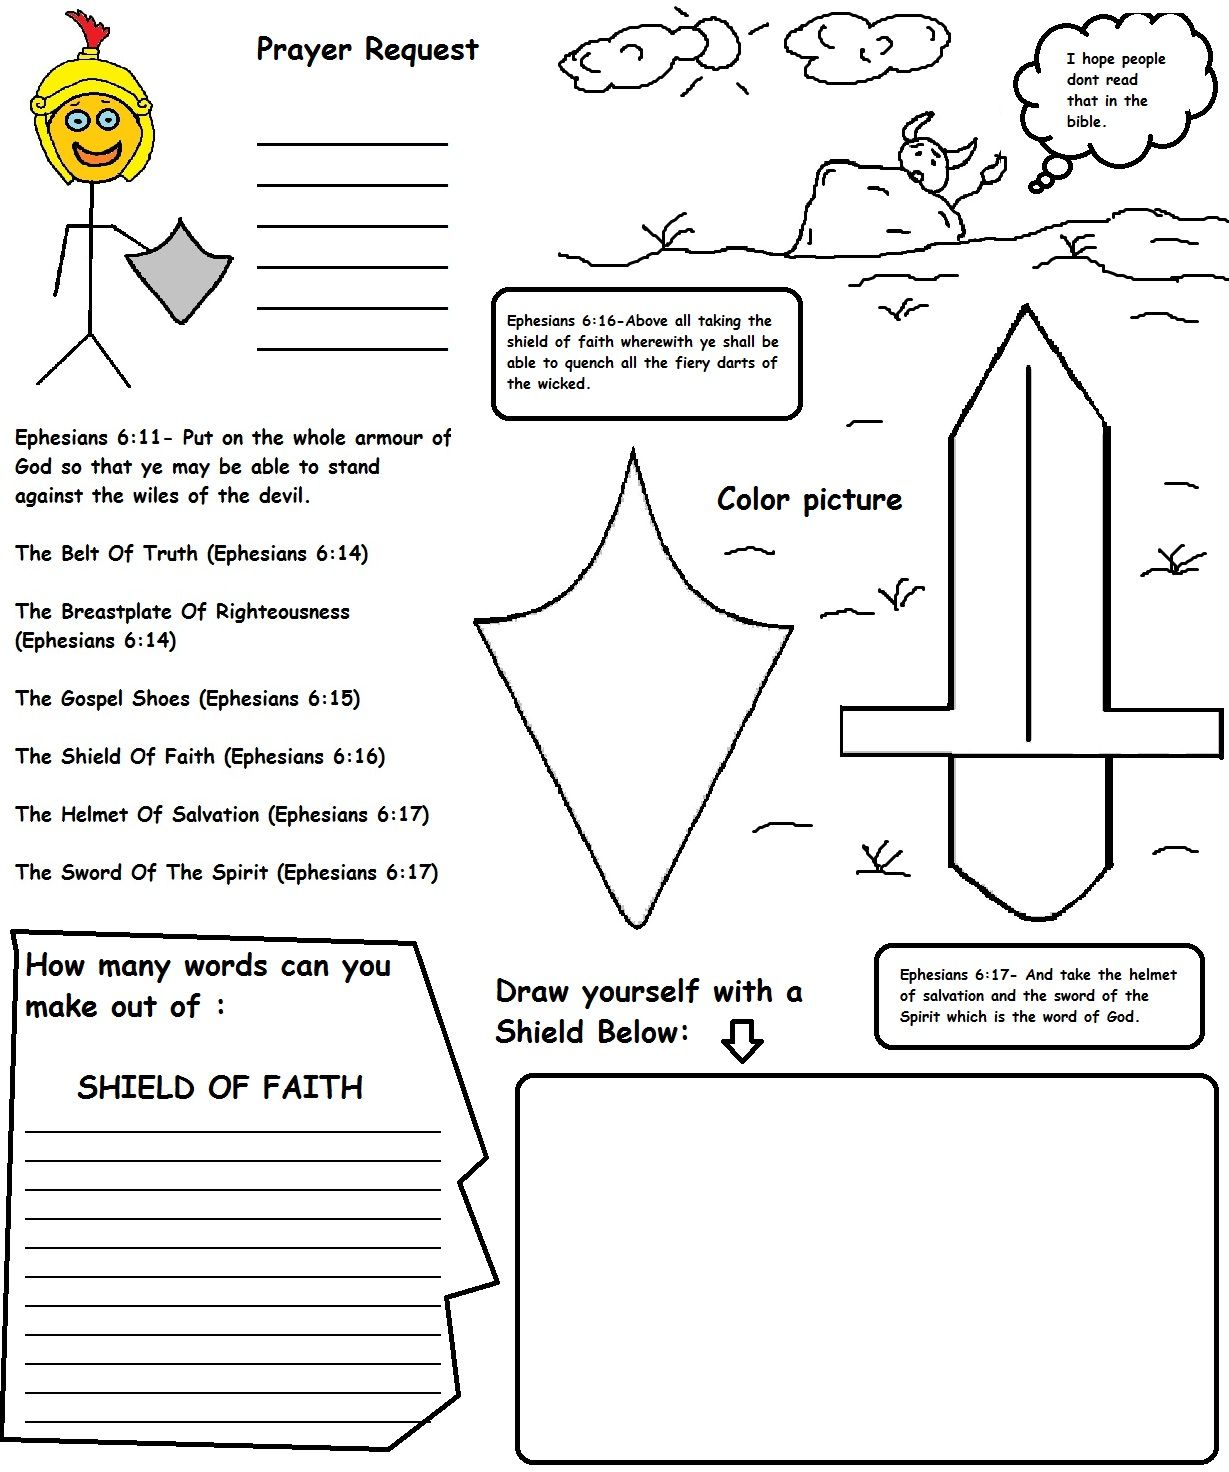 Pin By Elisabeth Kisselstein On Children S Ministry Resources